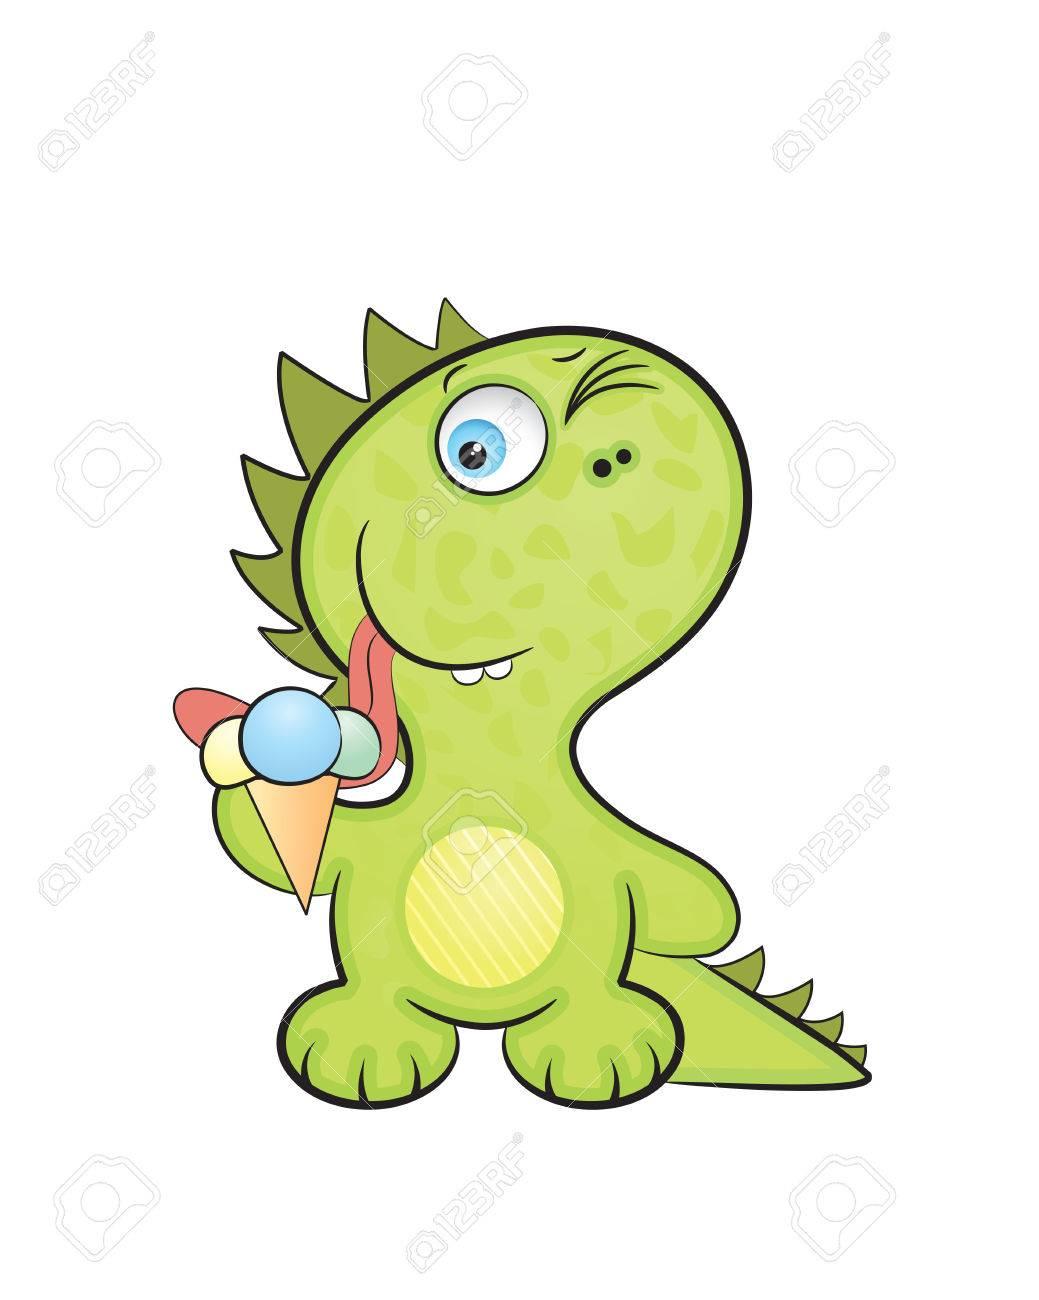 Cute cartoon style, the baby a dragon tries ice-cream. - 4614610